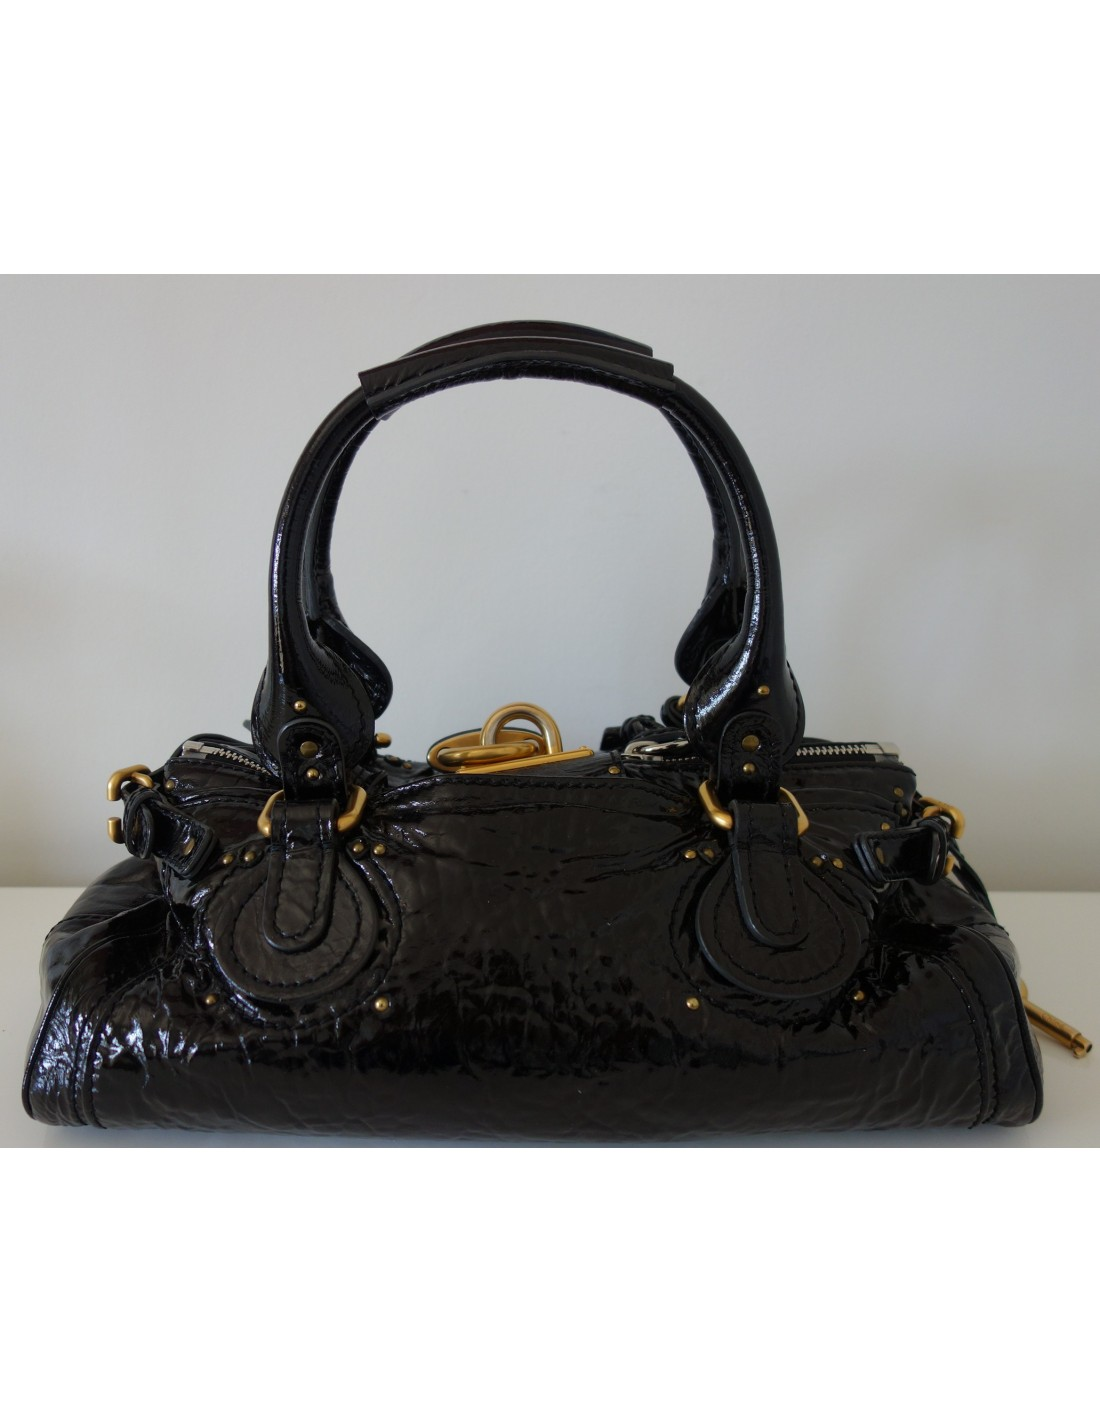 sac chloe paddington cuir verni noir atoutluxe boutique. Black Bedroom Furniture Sets. Home Design Ideas